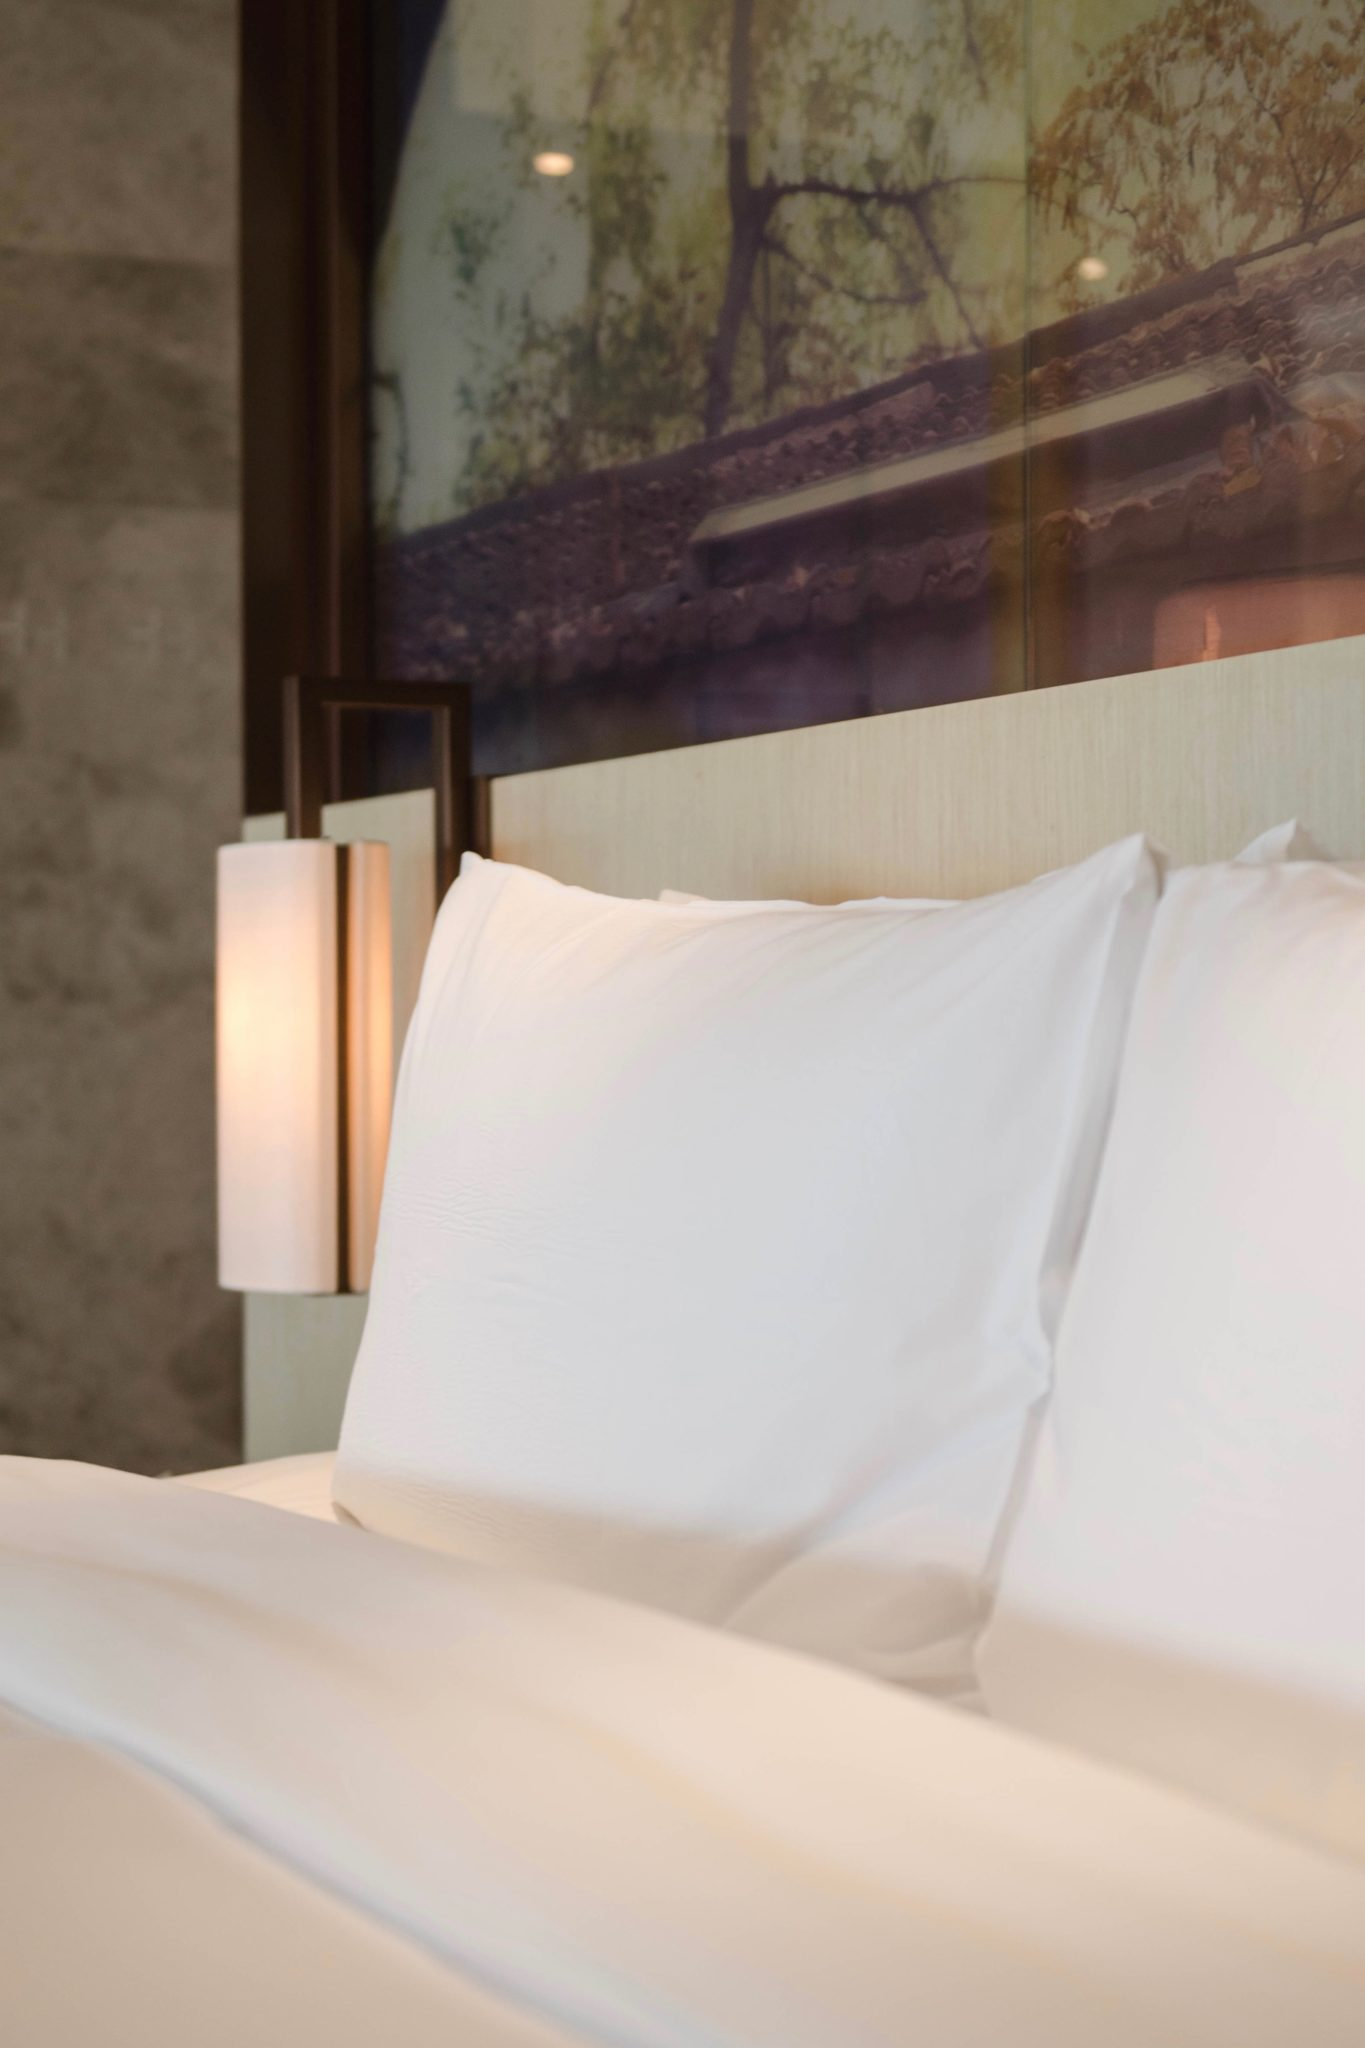 Die Betten im East Beijing Hotel